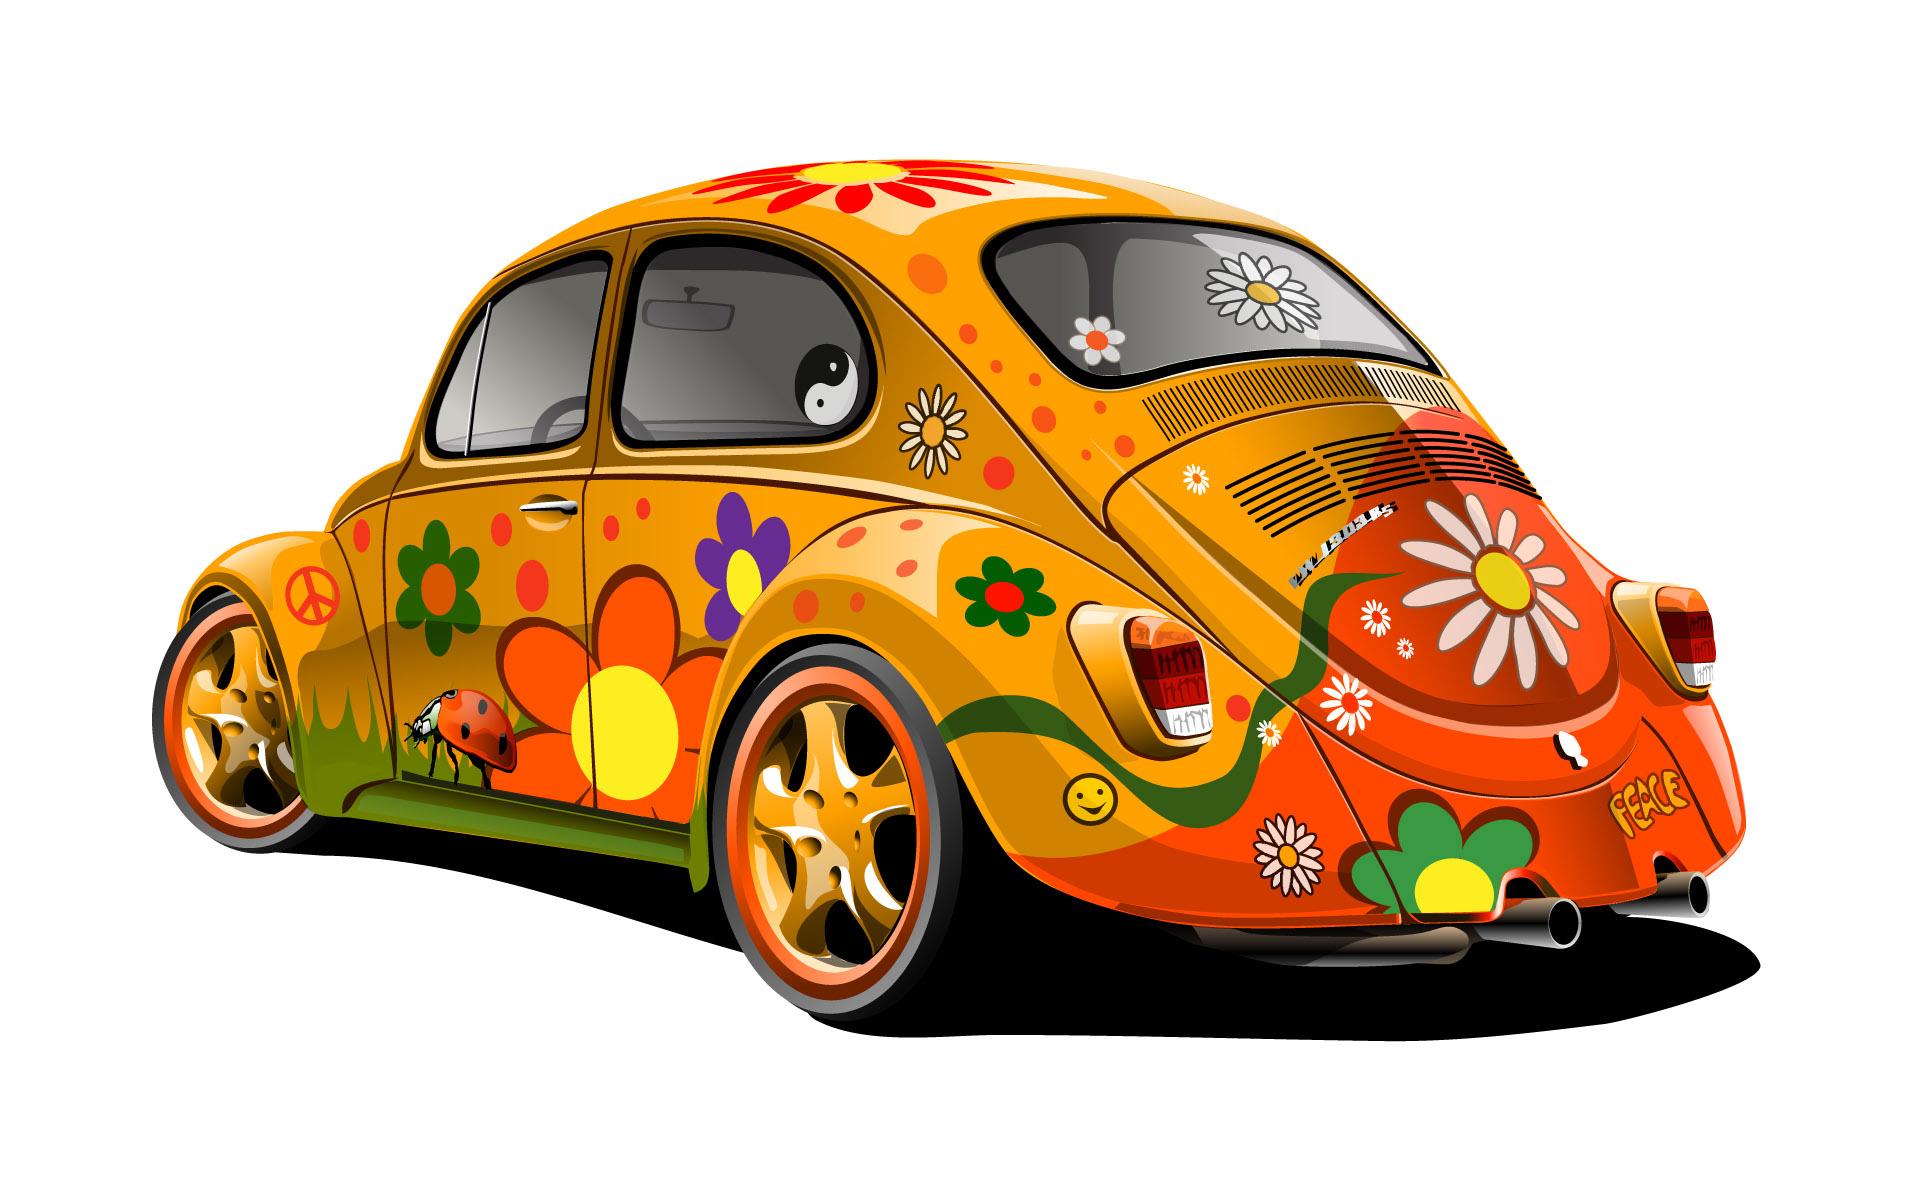 colorful hippie vw beetle wallpaper wide 1920x1200